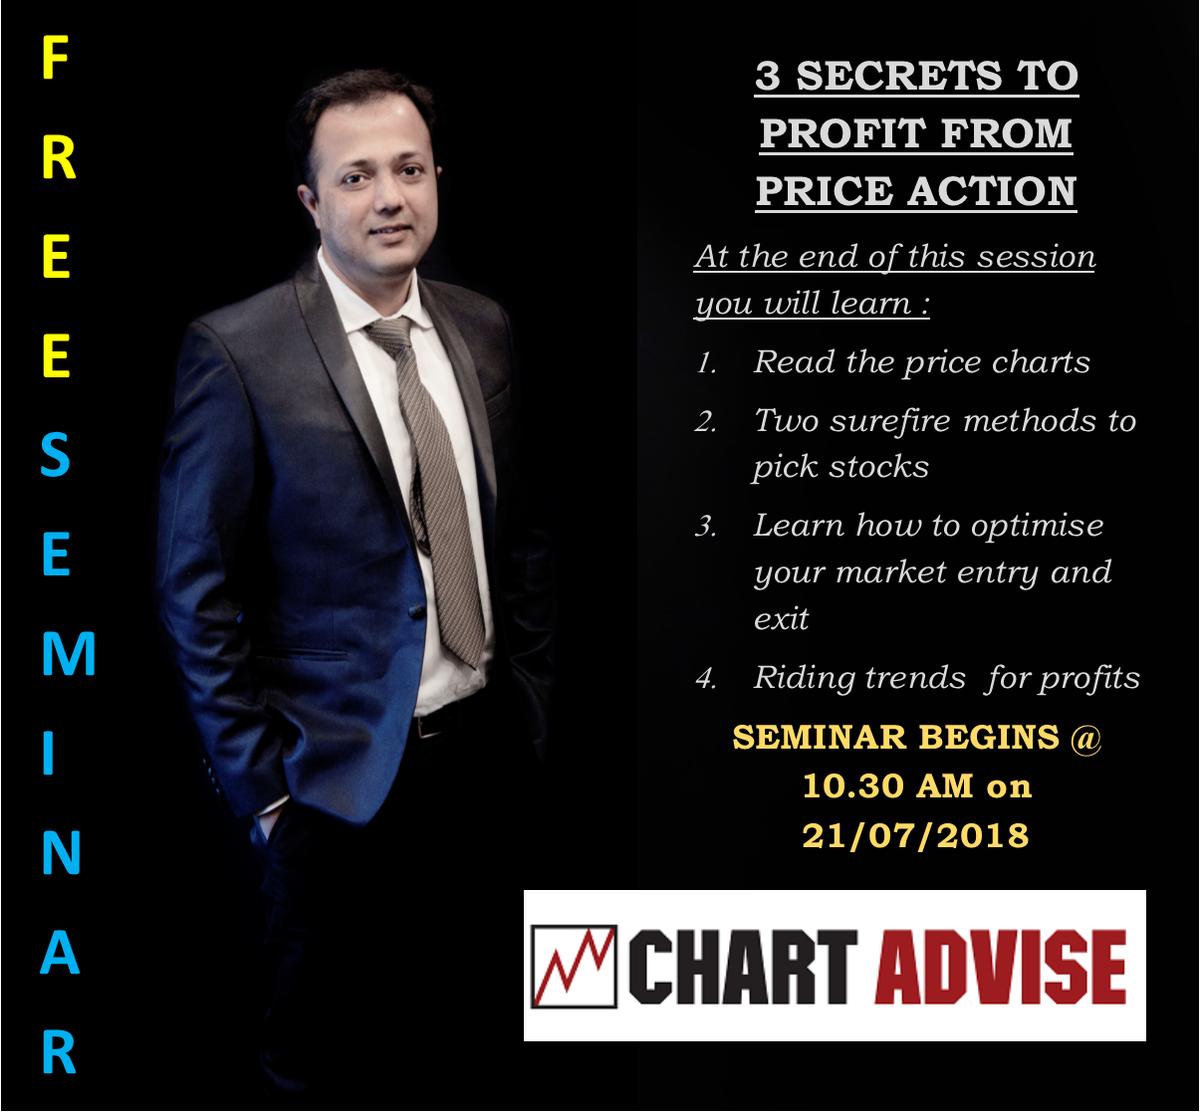 Chart_Advise photo